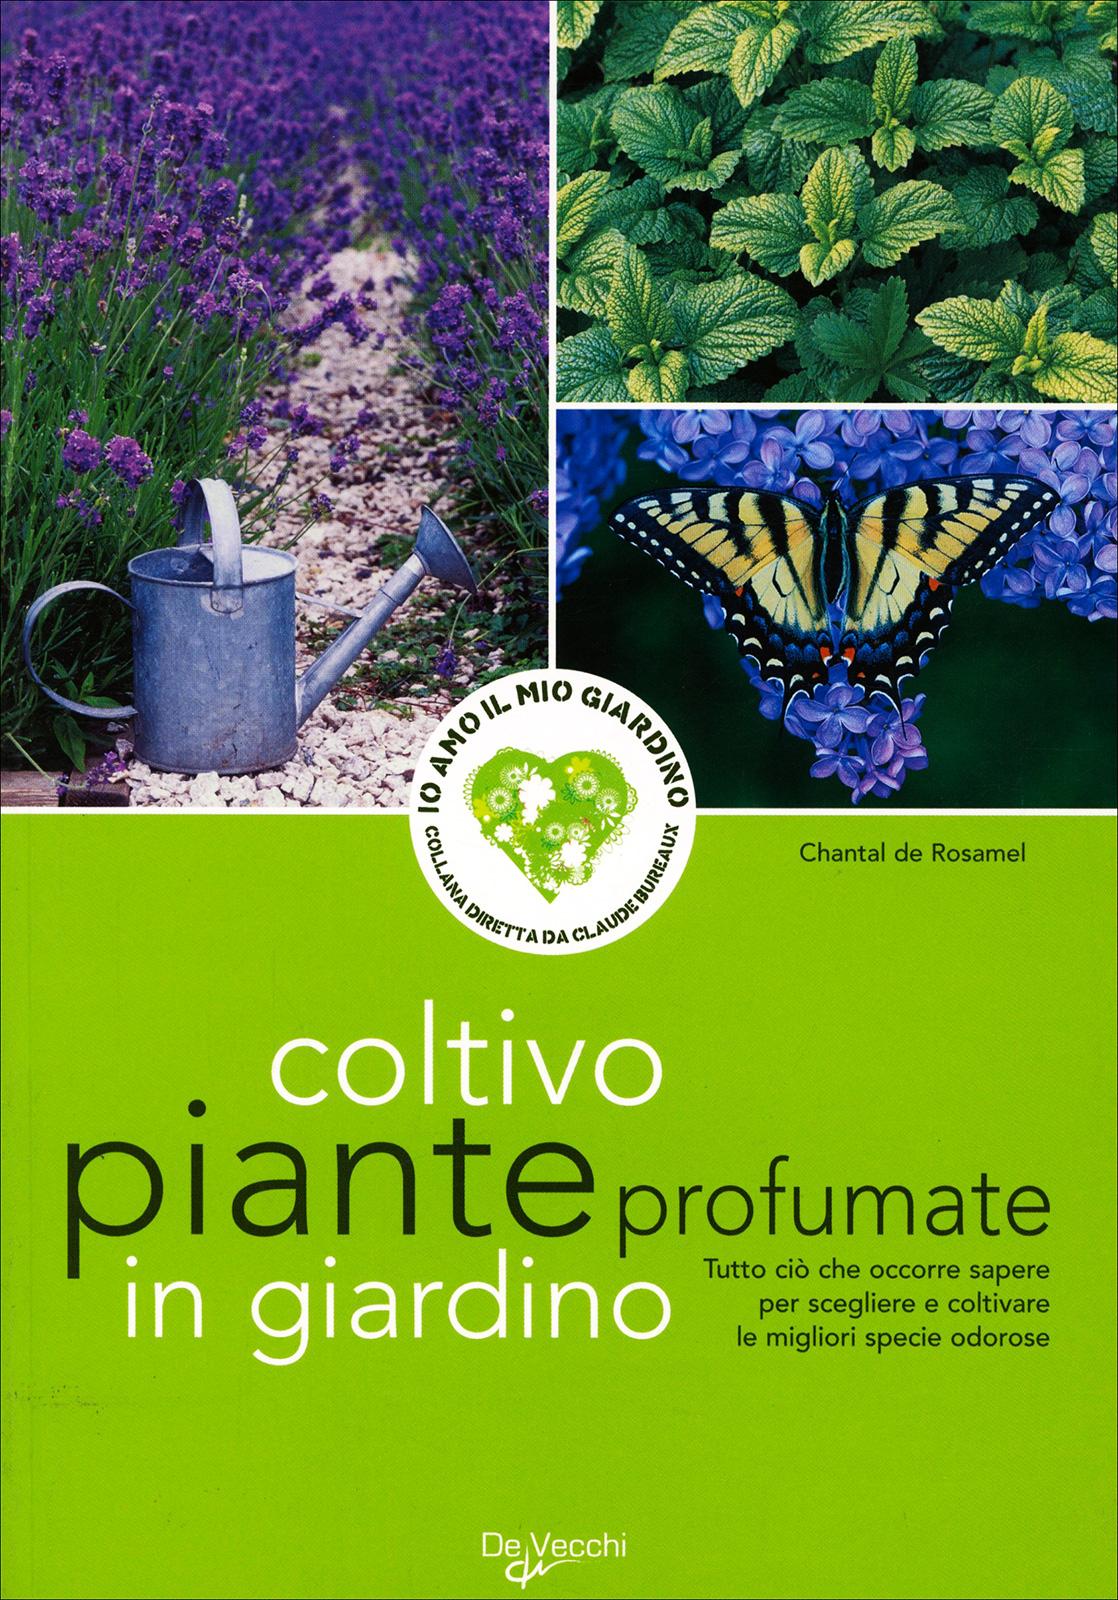 Piante profumate da giardino simple eucalipto azul australiano profumato in vaso cm with piante - Piante da giardino profumate ...